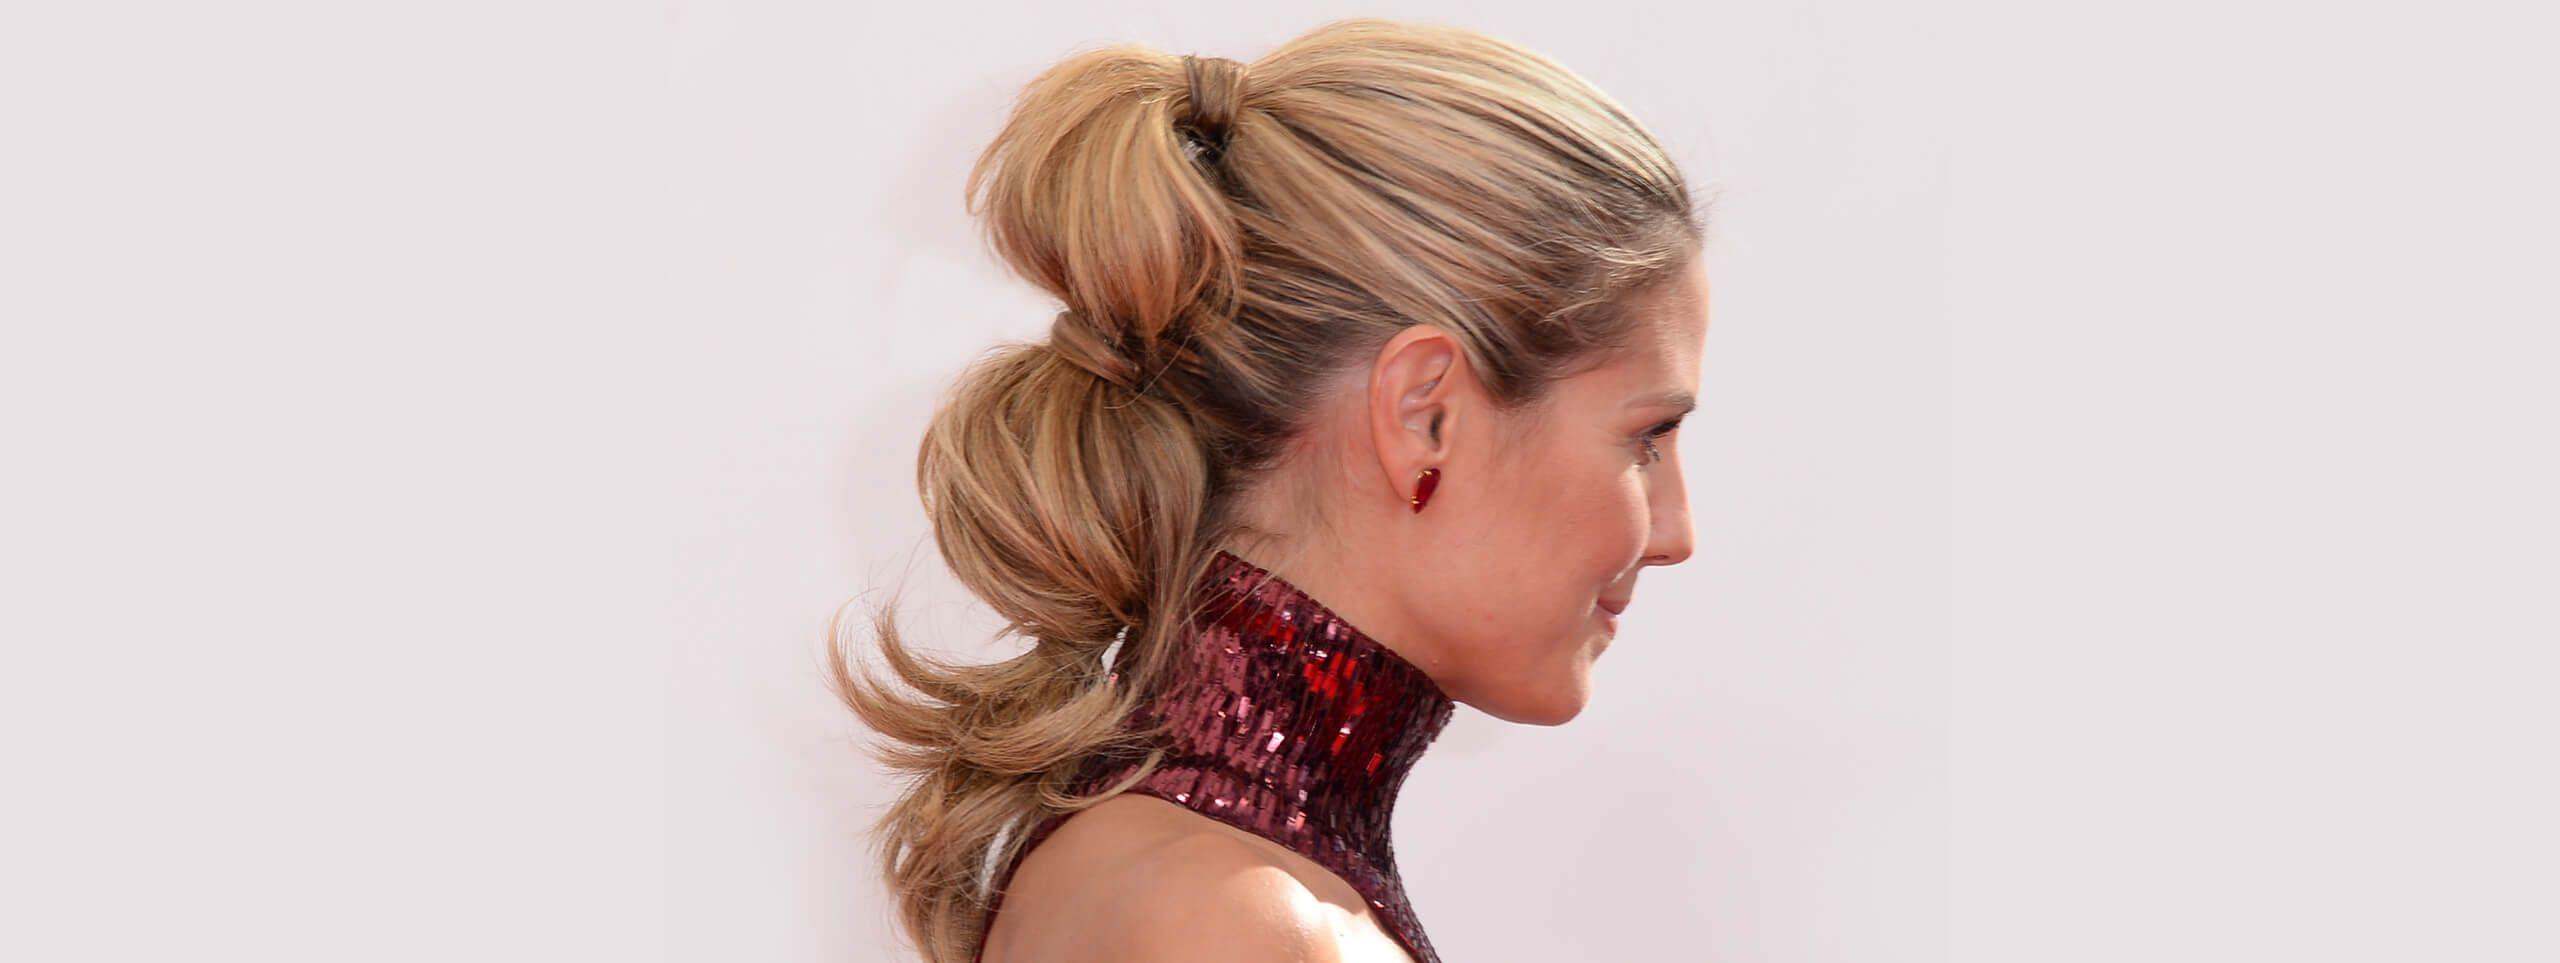 Coleta alta tres nudos de Heidi Klum